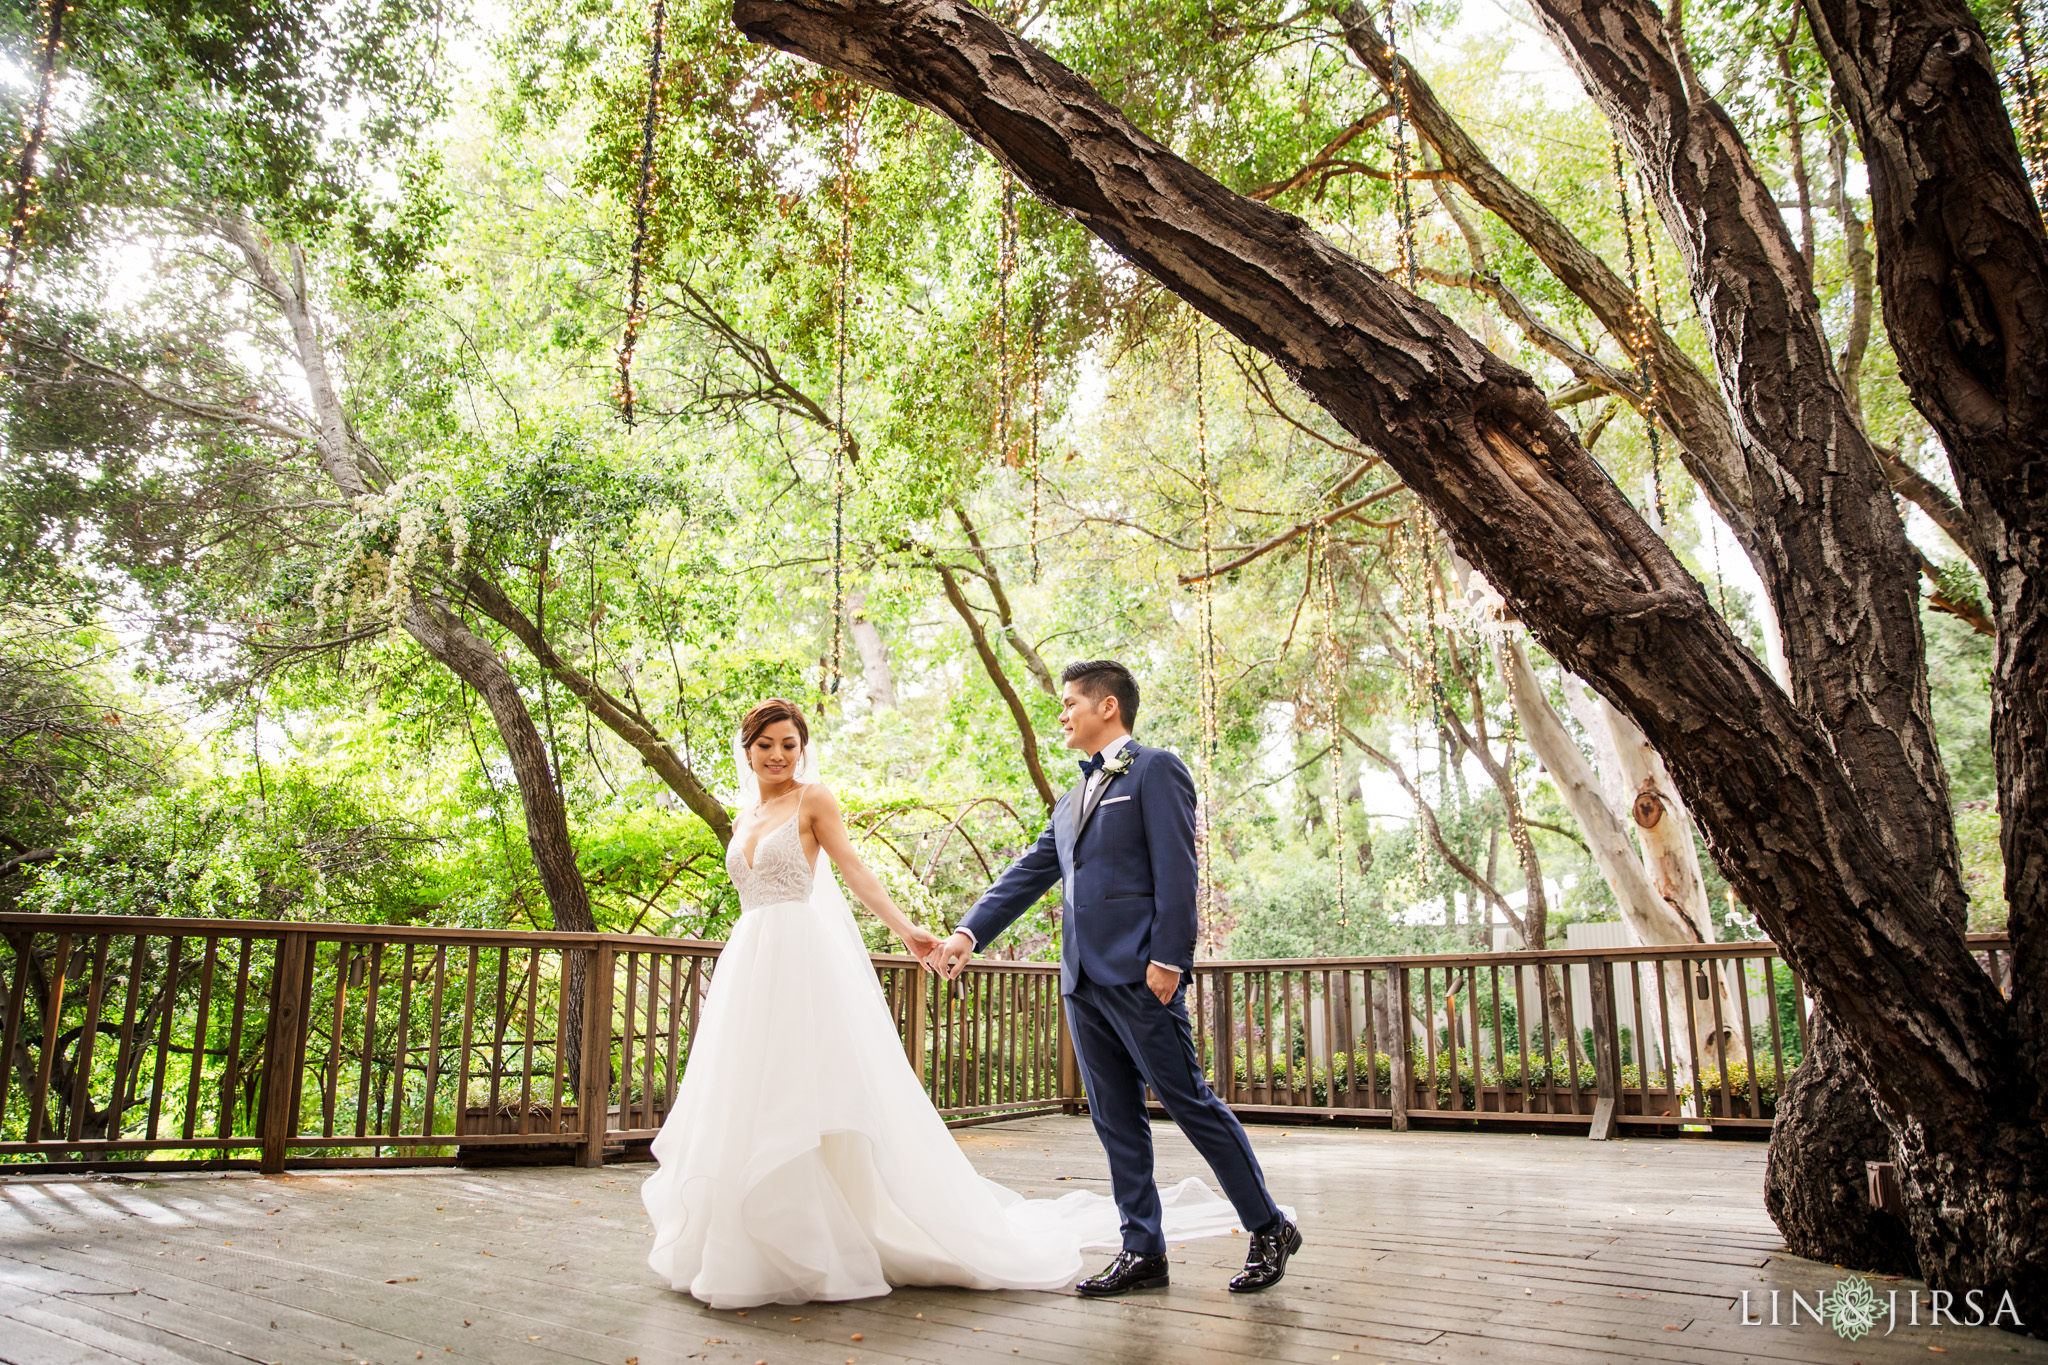 16 Calamigos Ranch Malibu Wedding Photography